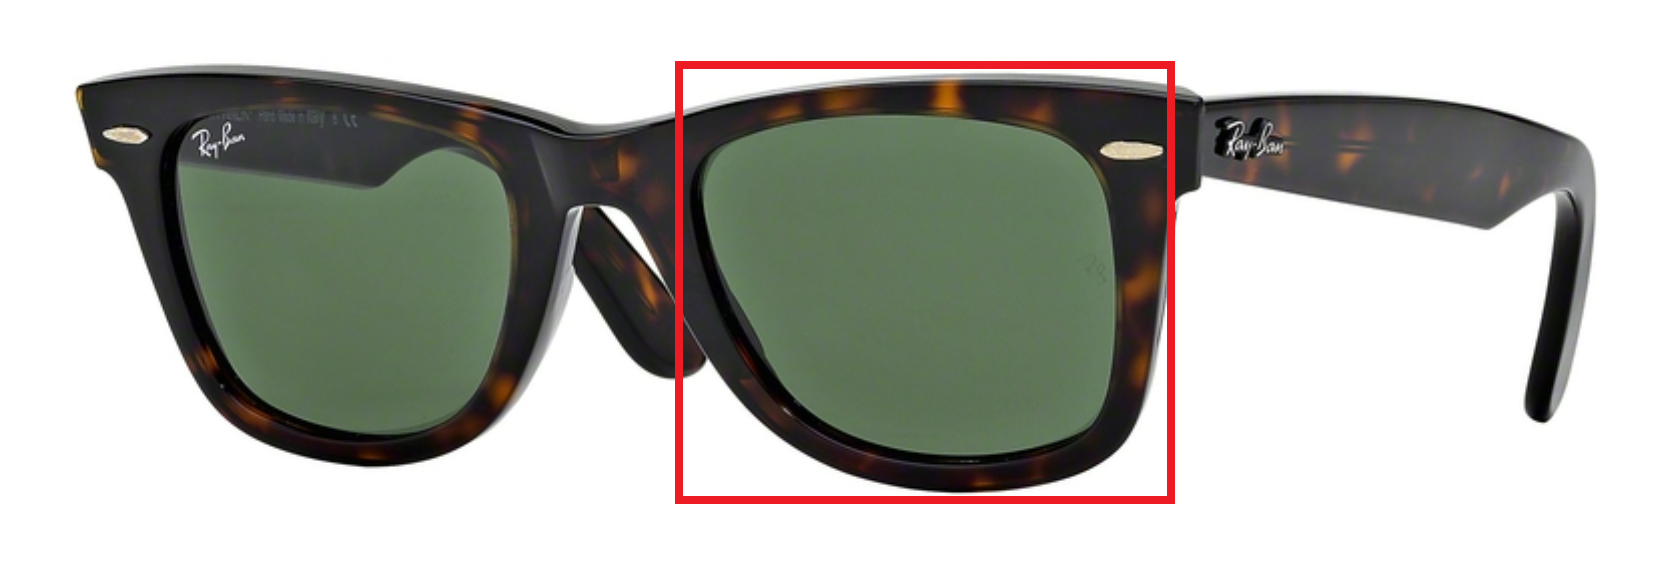 50953b2c7c4b01 Glazen Ray-Ban zonnebril